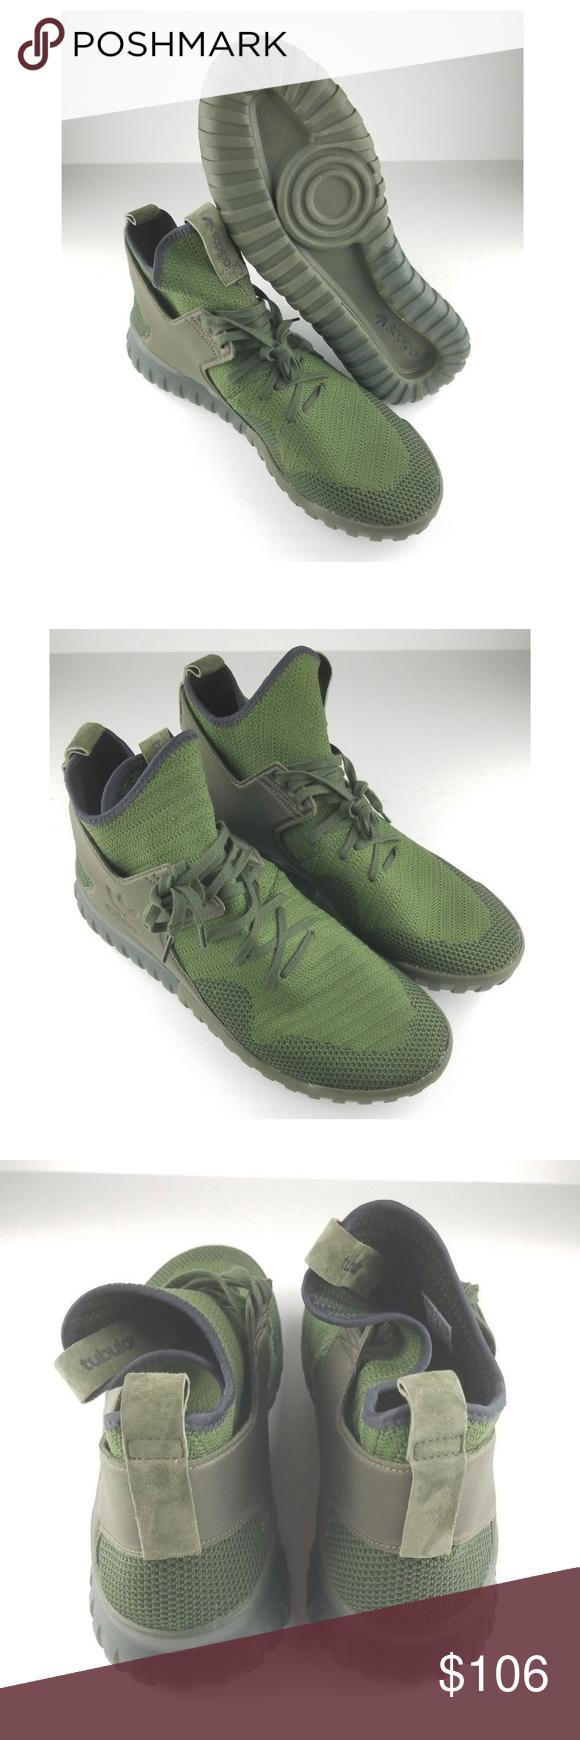 Adidas Originals Tubular | X Primeknit Hombre Talla 13 NWT | Tubular My Posh a8654b